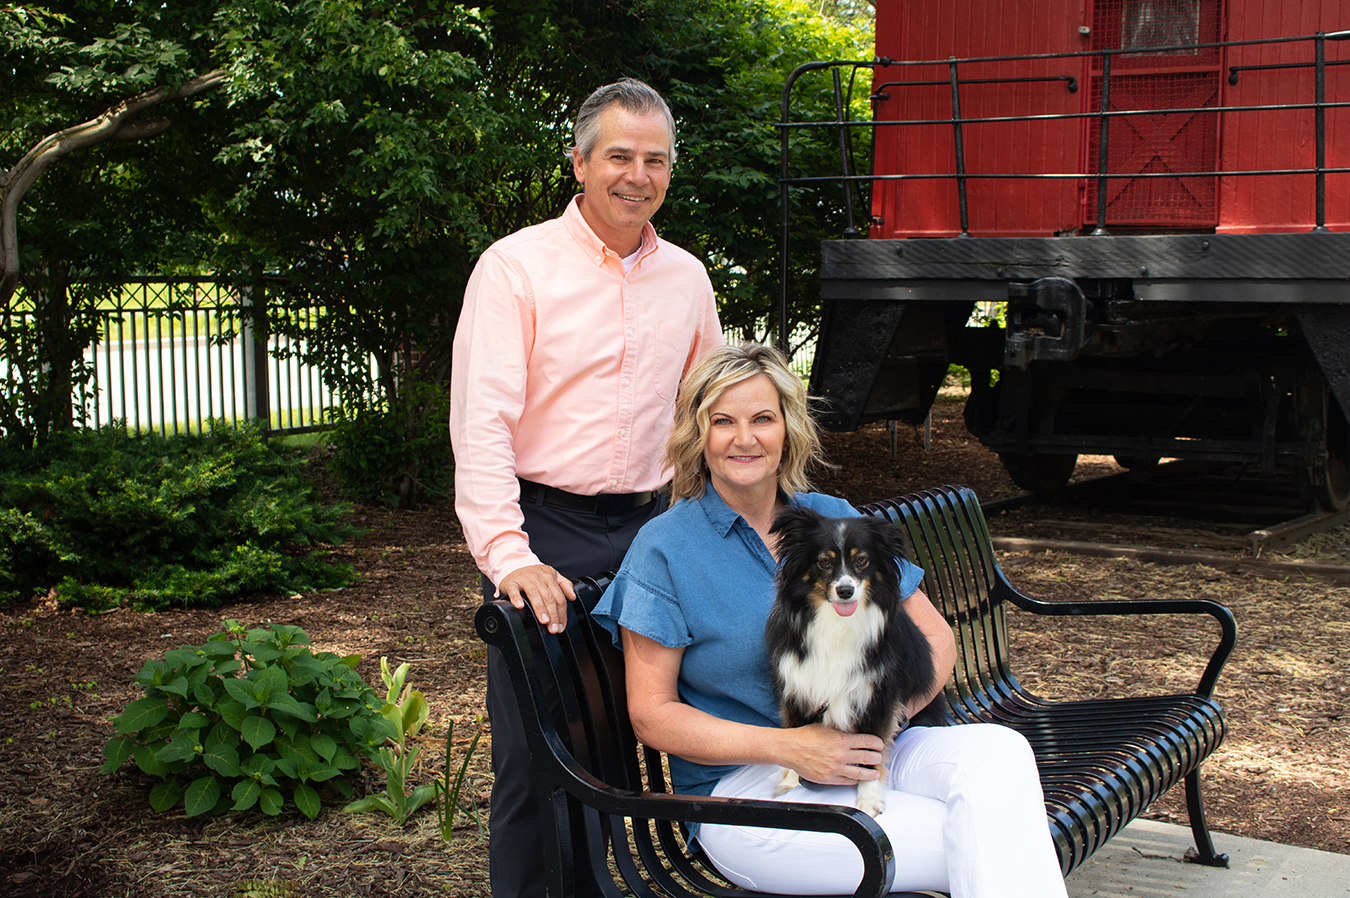 PrairieFire founder and CEO, Matt Meline, CFP®, his wife Lisa and their dog Shae.